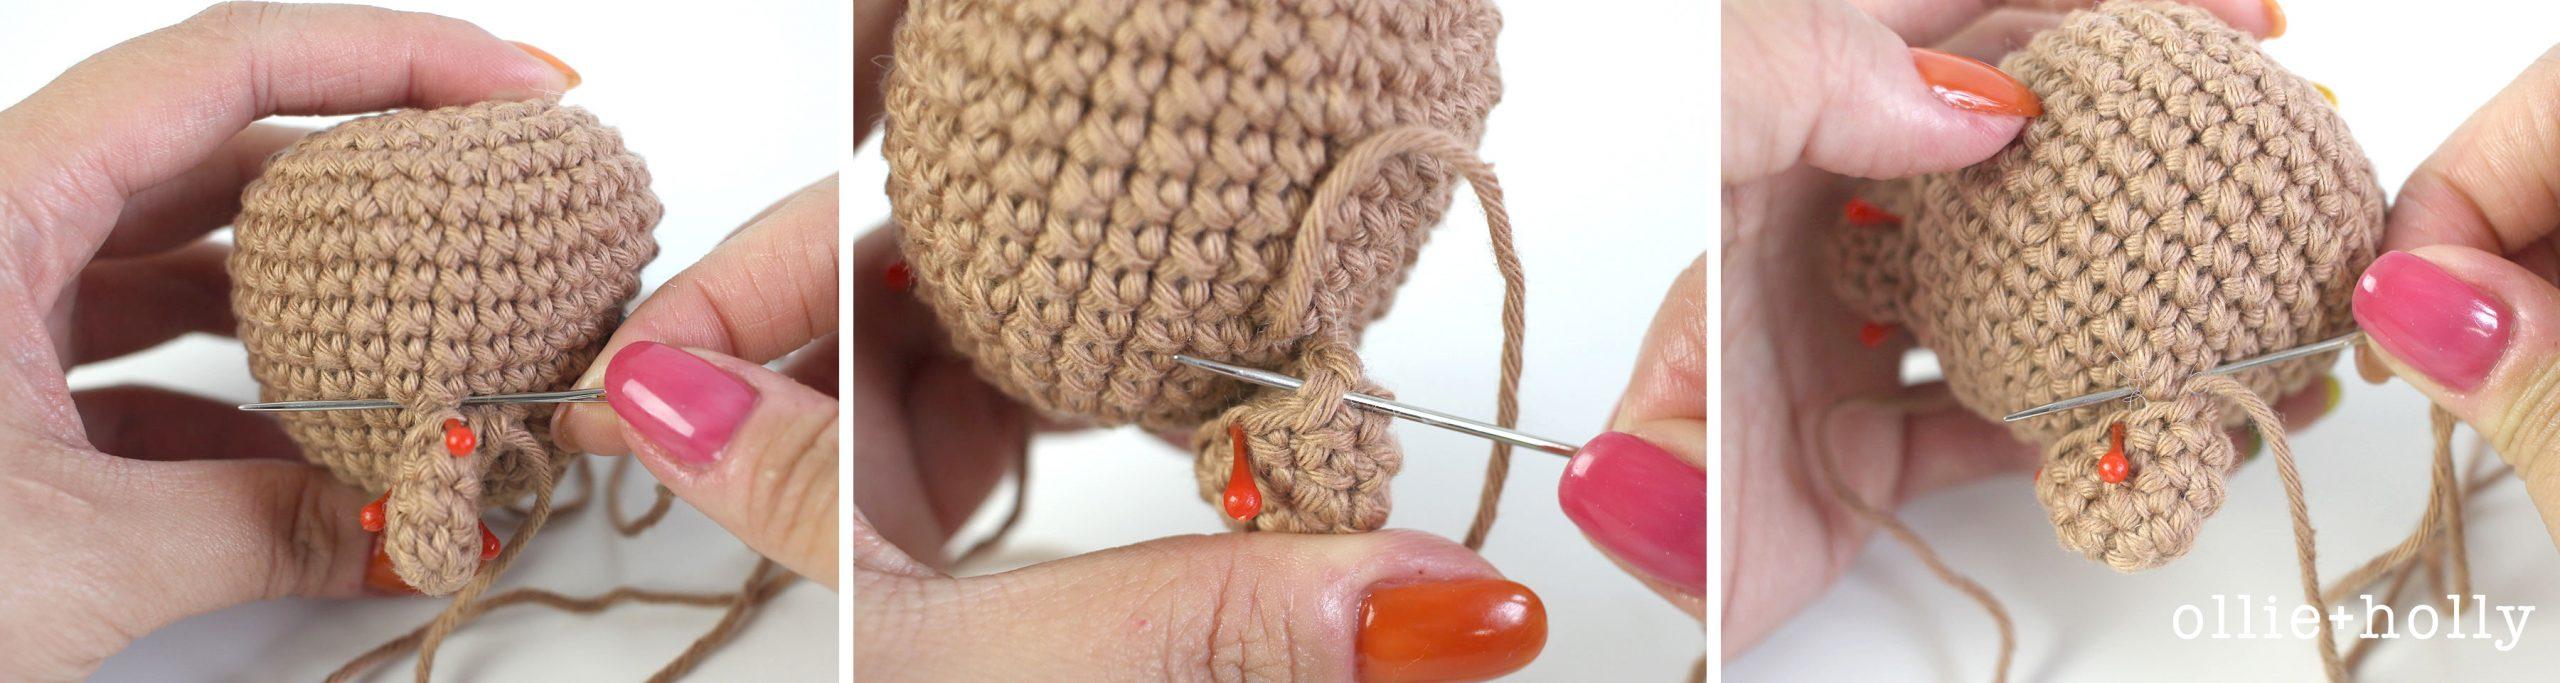 Free Bernadette the Bear Stuffed Animal Amigurumi Crochet Pattern Step 3